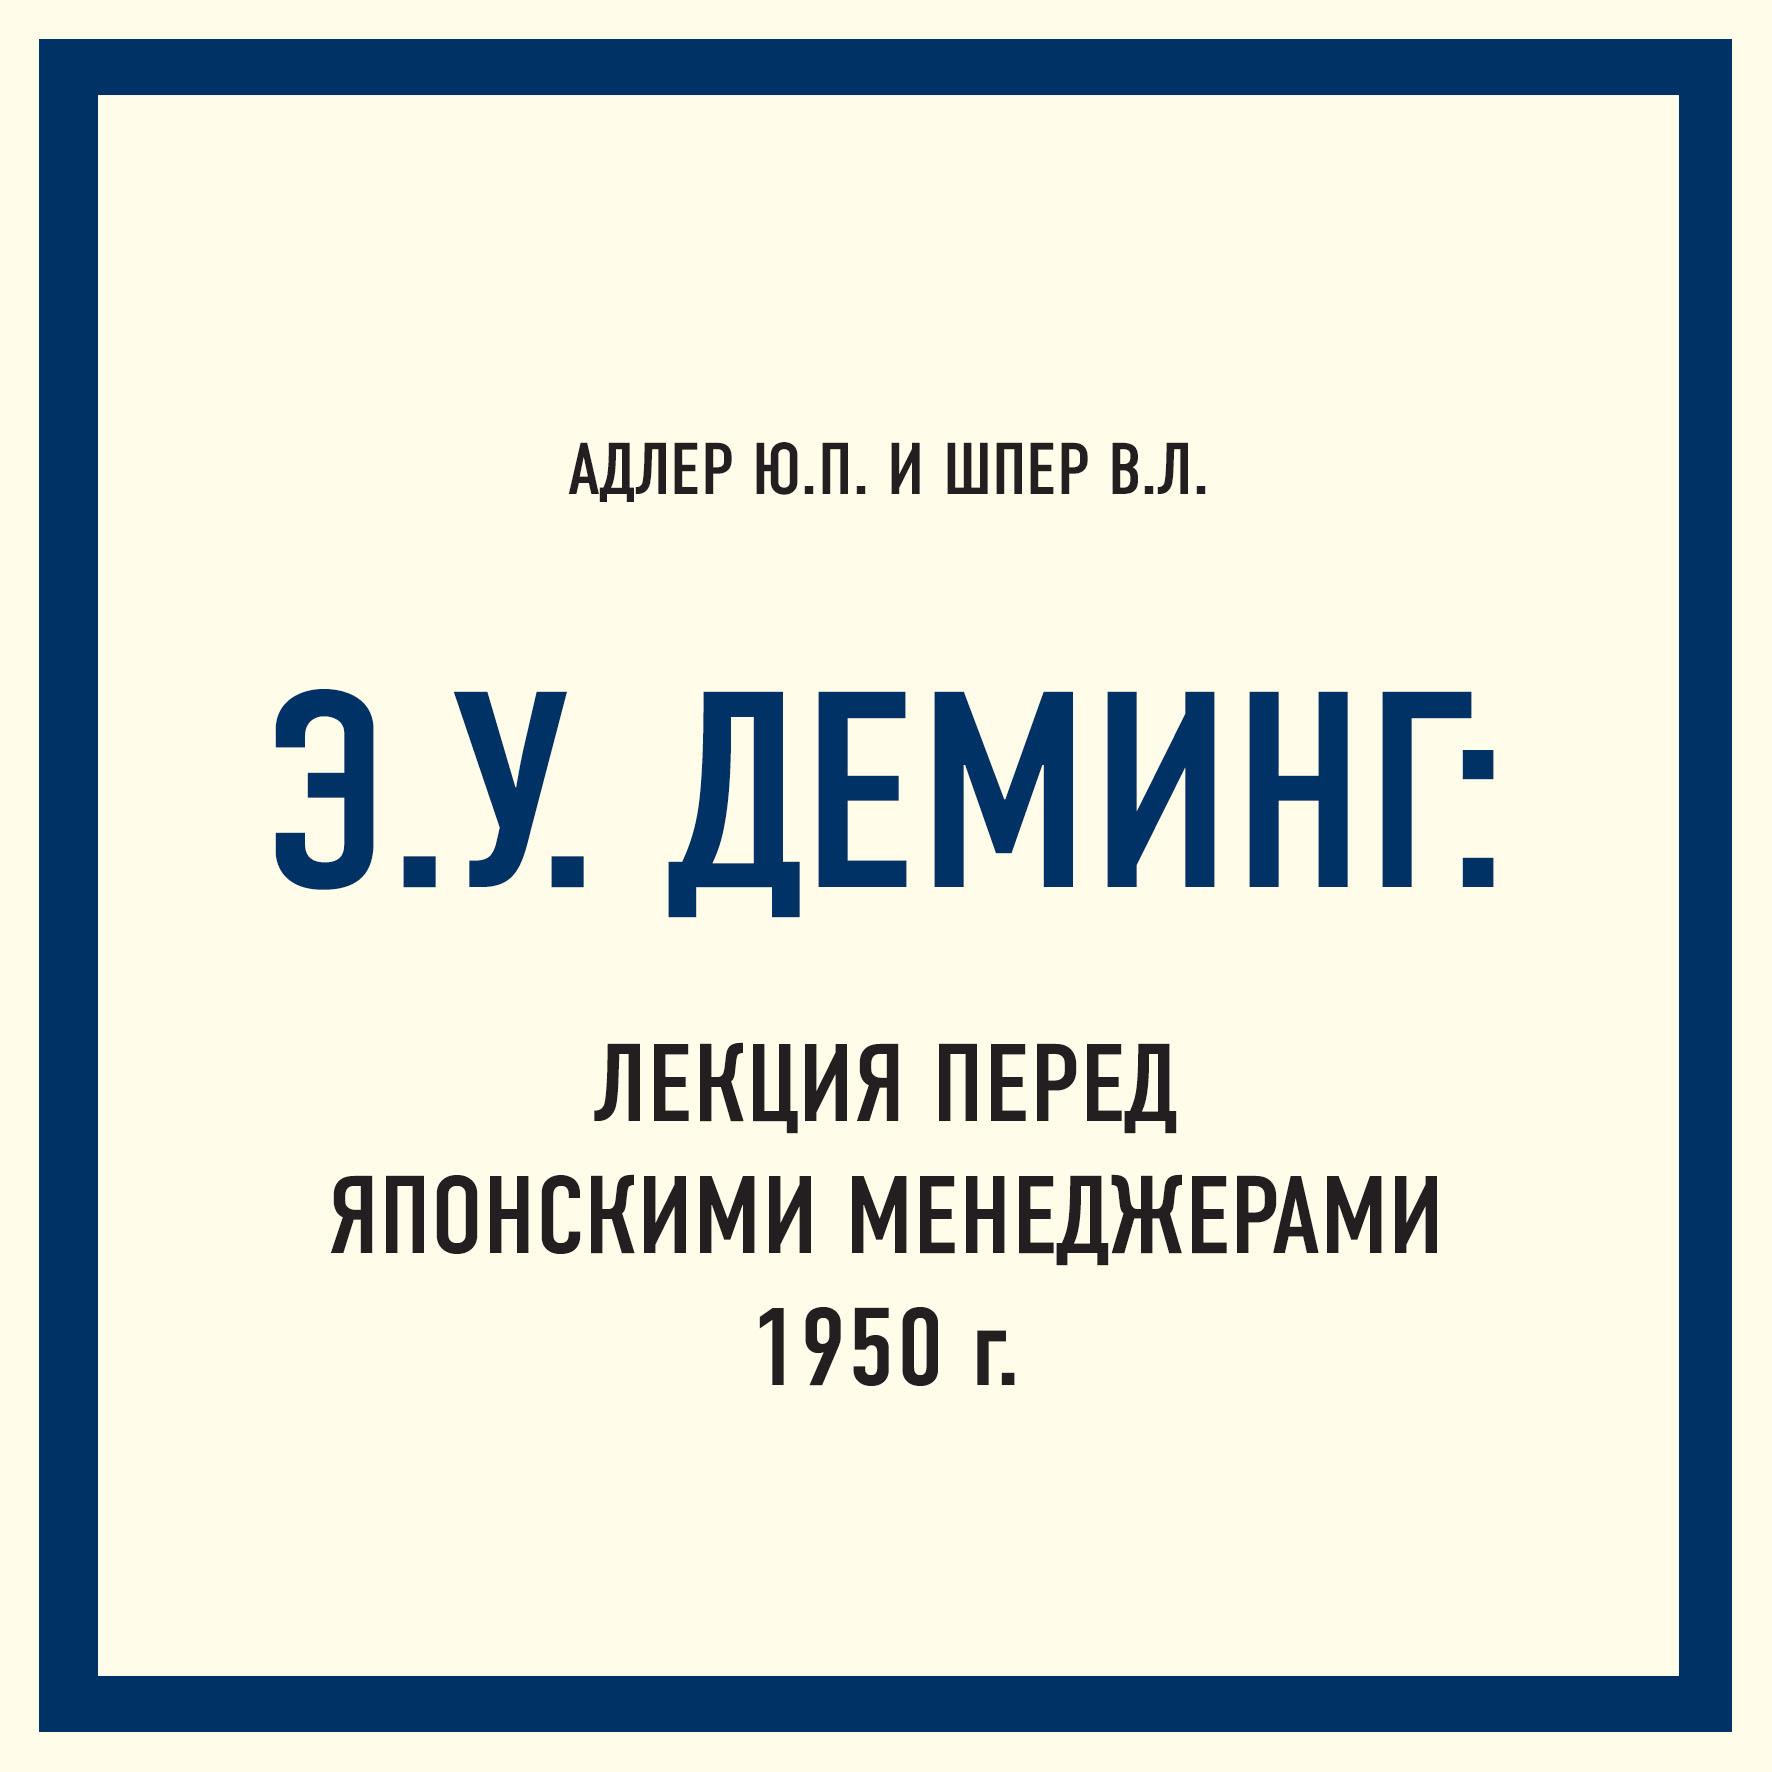 Э.У. Деминг: Лекция перед японскими менеджерами 1950 г.